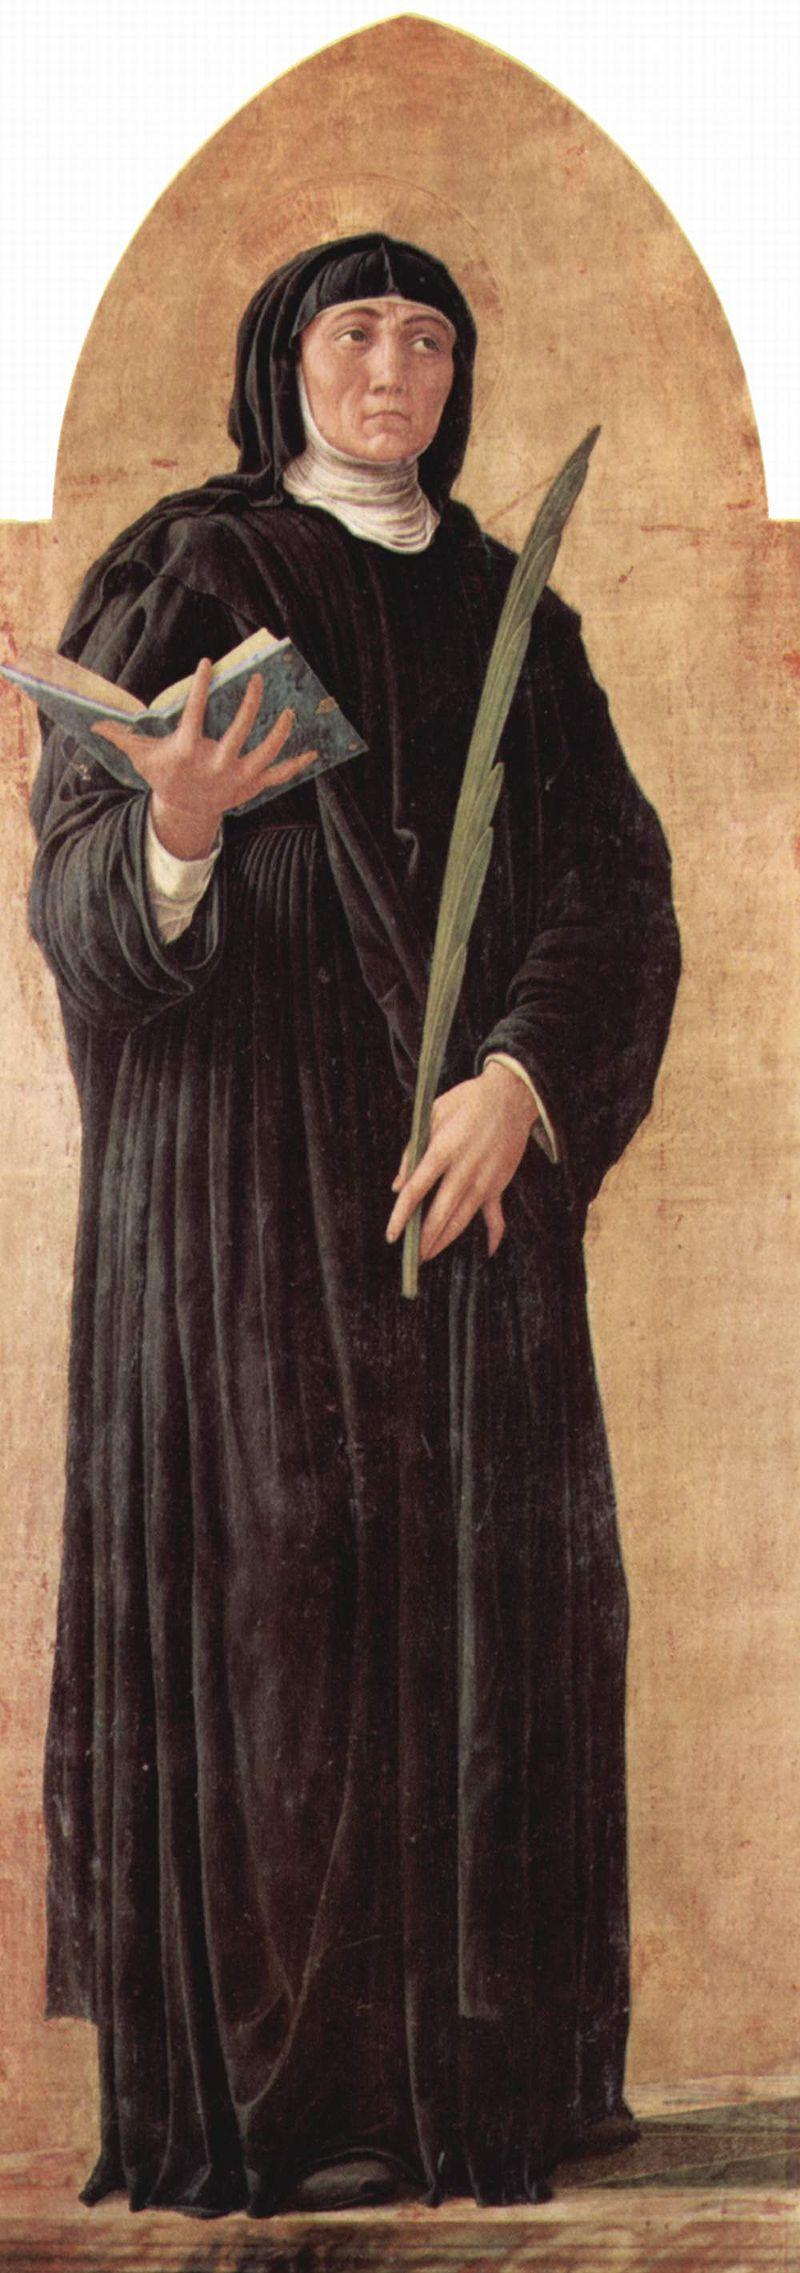 800px-St. Scholastica_Andrea_Mantegna_019.jpg